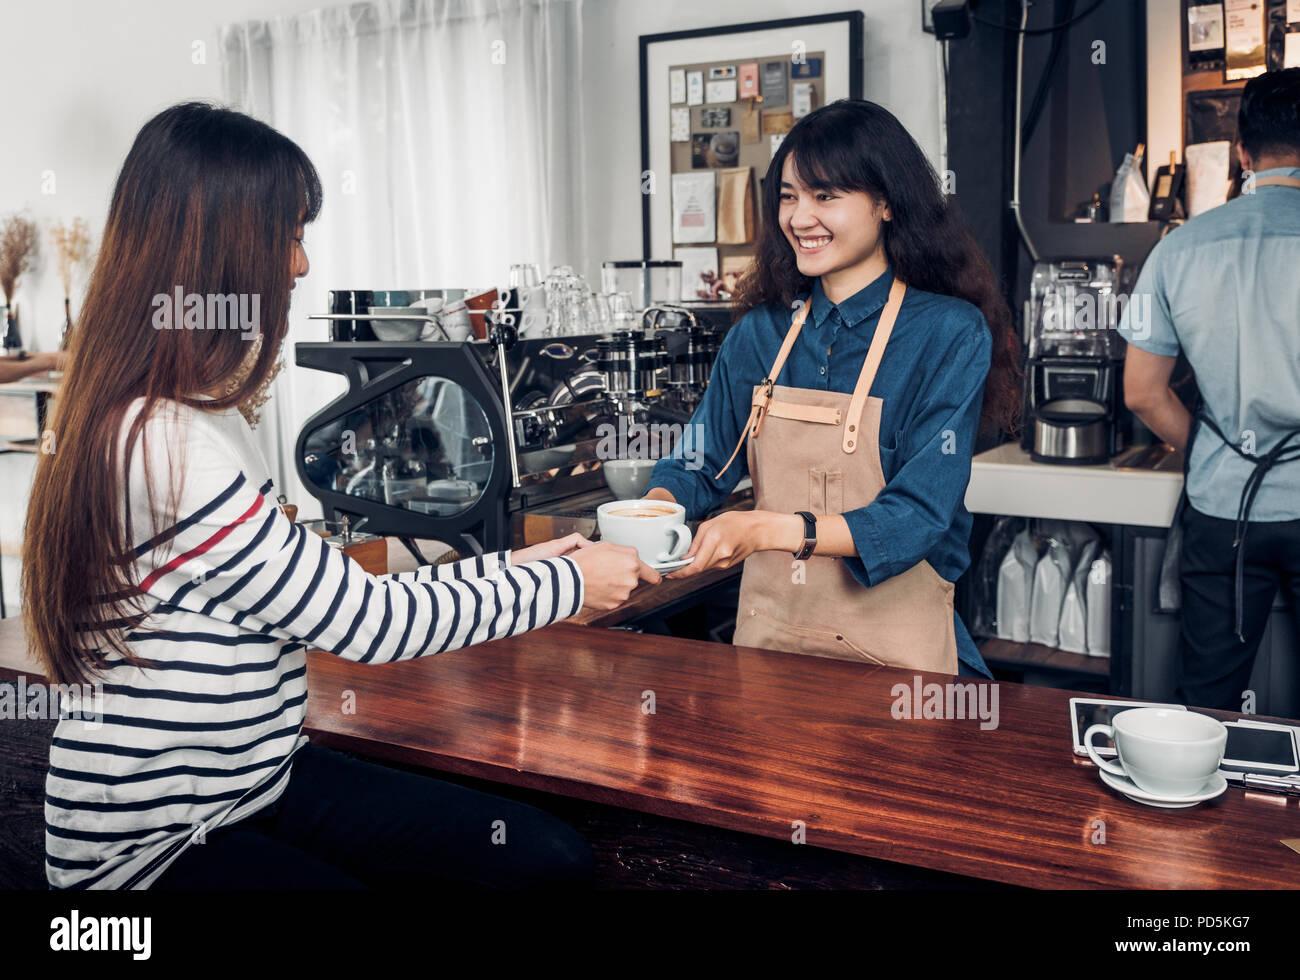 barista serviert heisse tasse kaffee an